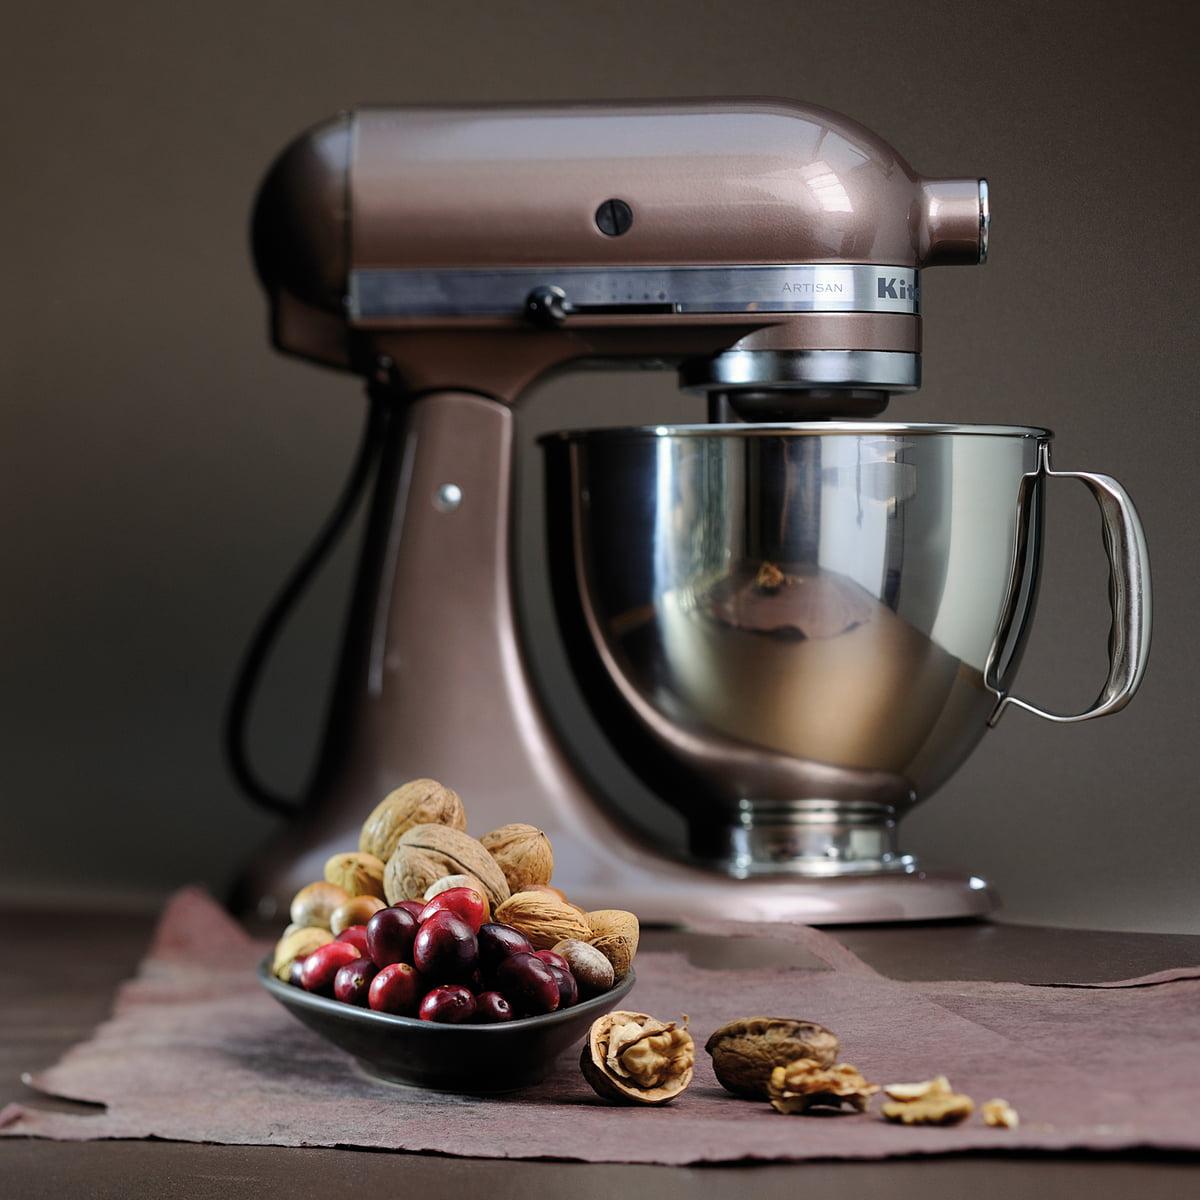 Artisan Kitchen Appliance 4,8 l by KitchenAid on kitchenaid mixer, kitchenaid artisan stand mixer, kitchenaid artisan mixer, kitchenaid stand mixer,